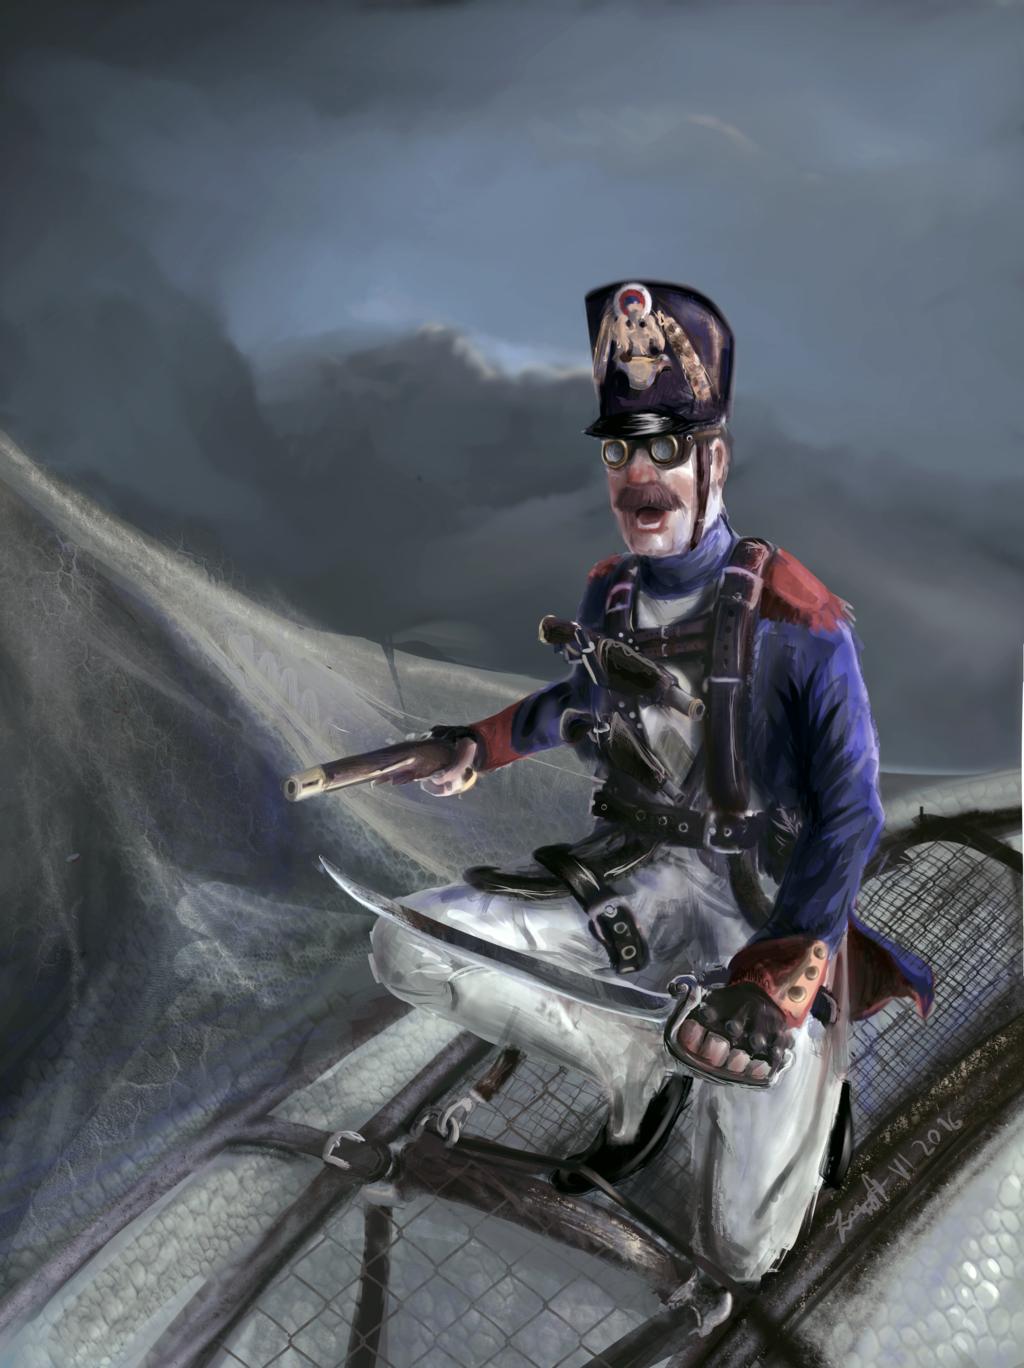 Most recent image: Vieille Garde aviateur